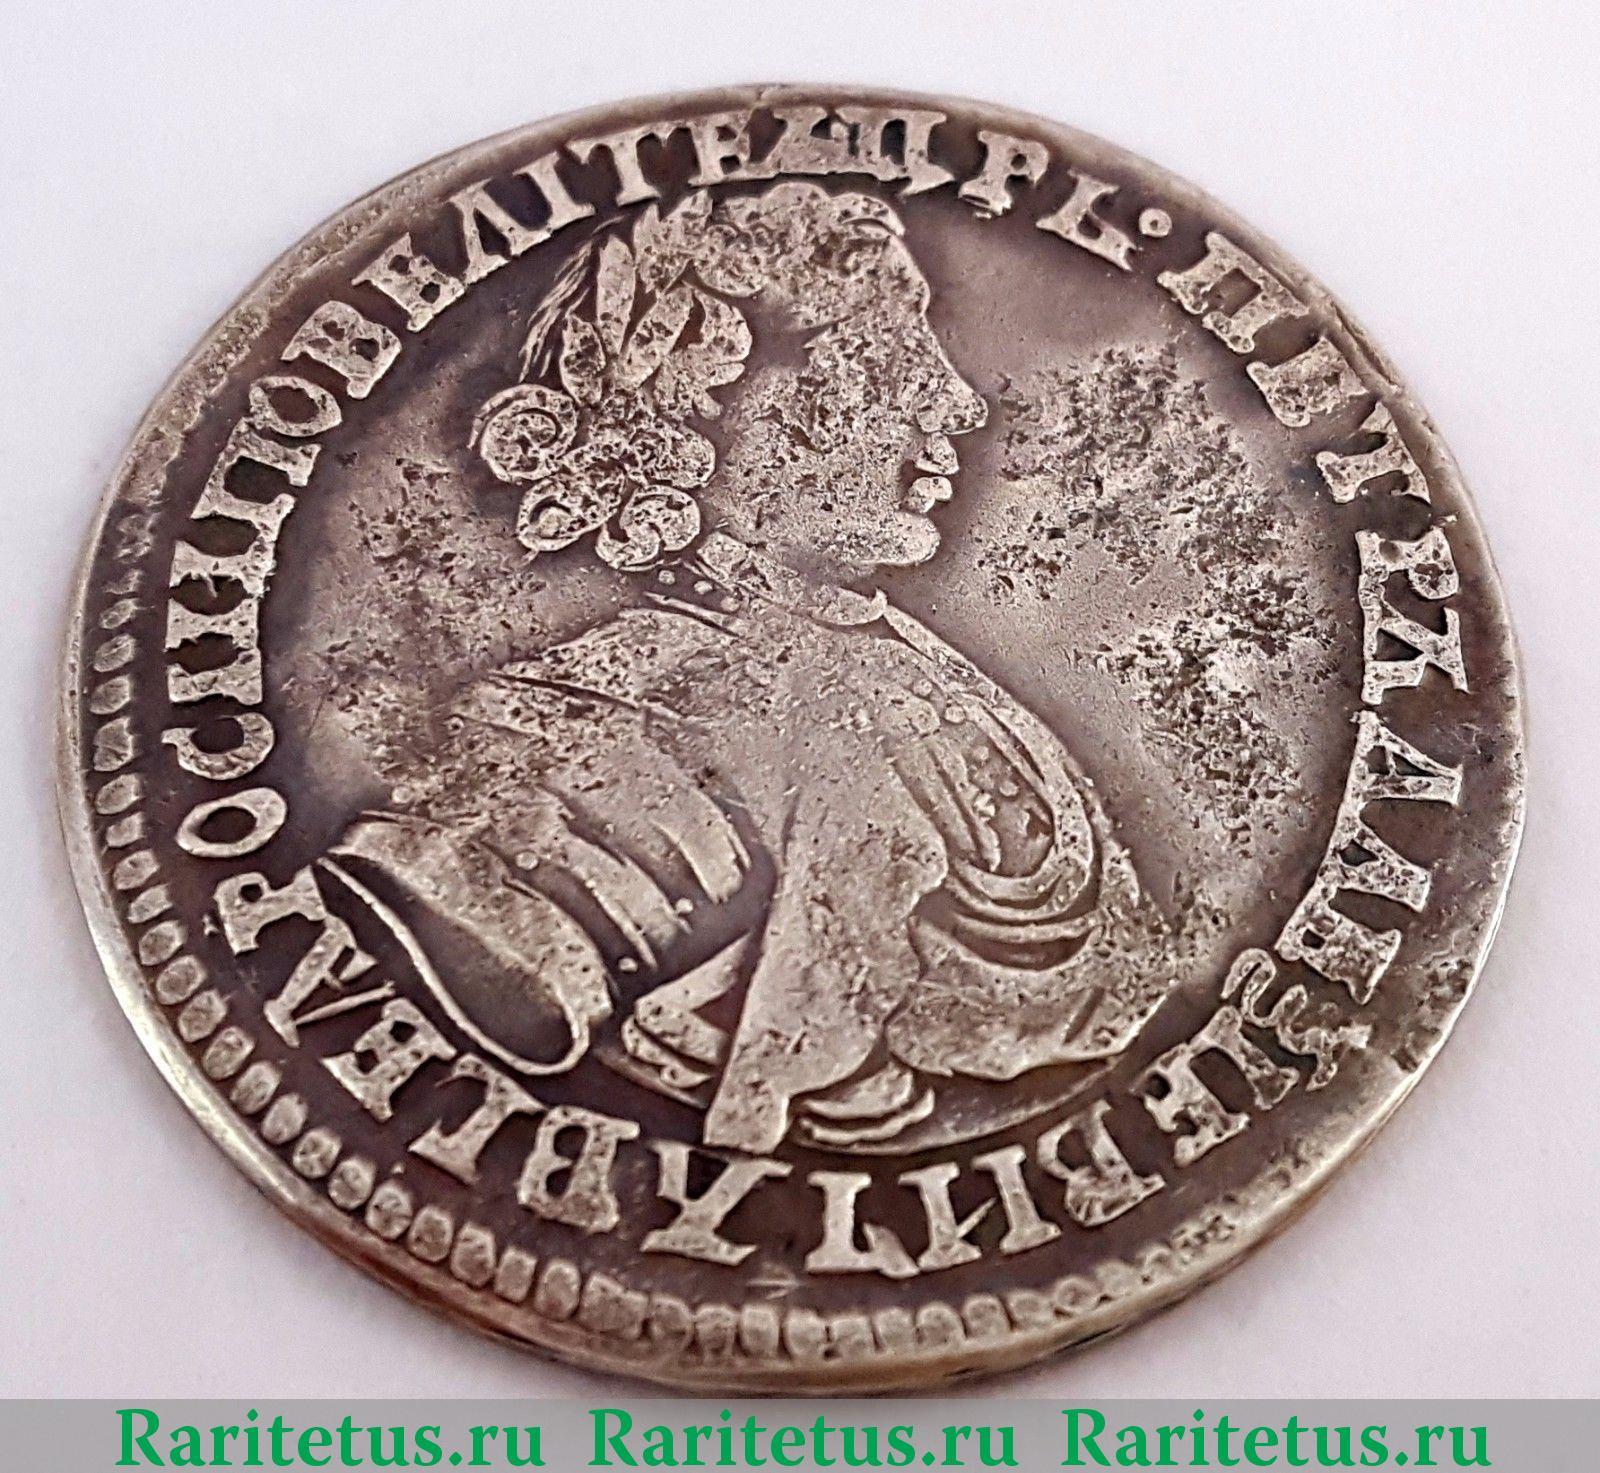 Продать редкую монету на аукционе хидэе ногути